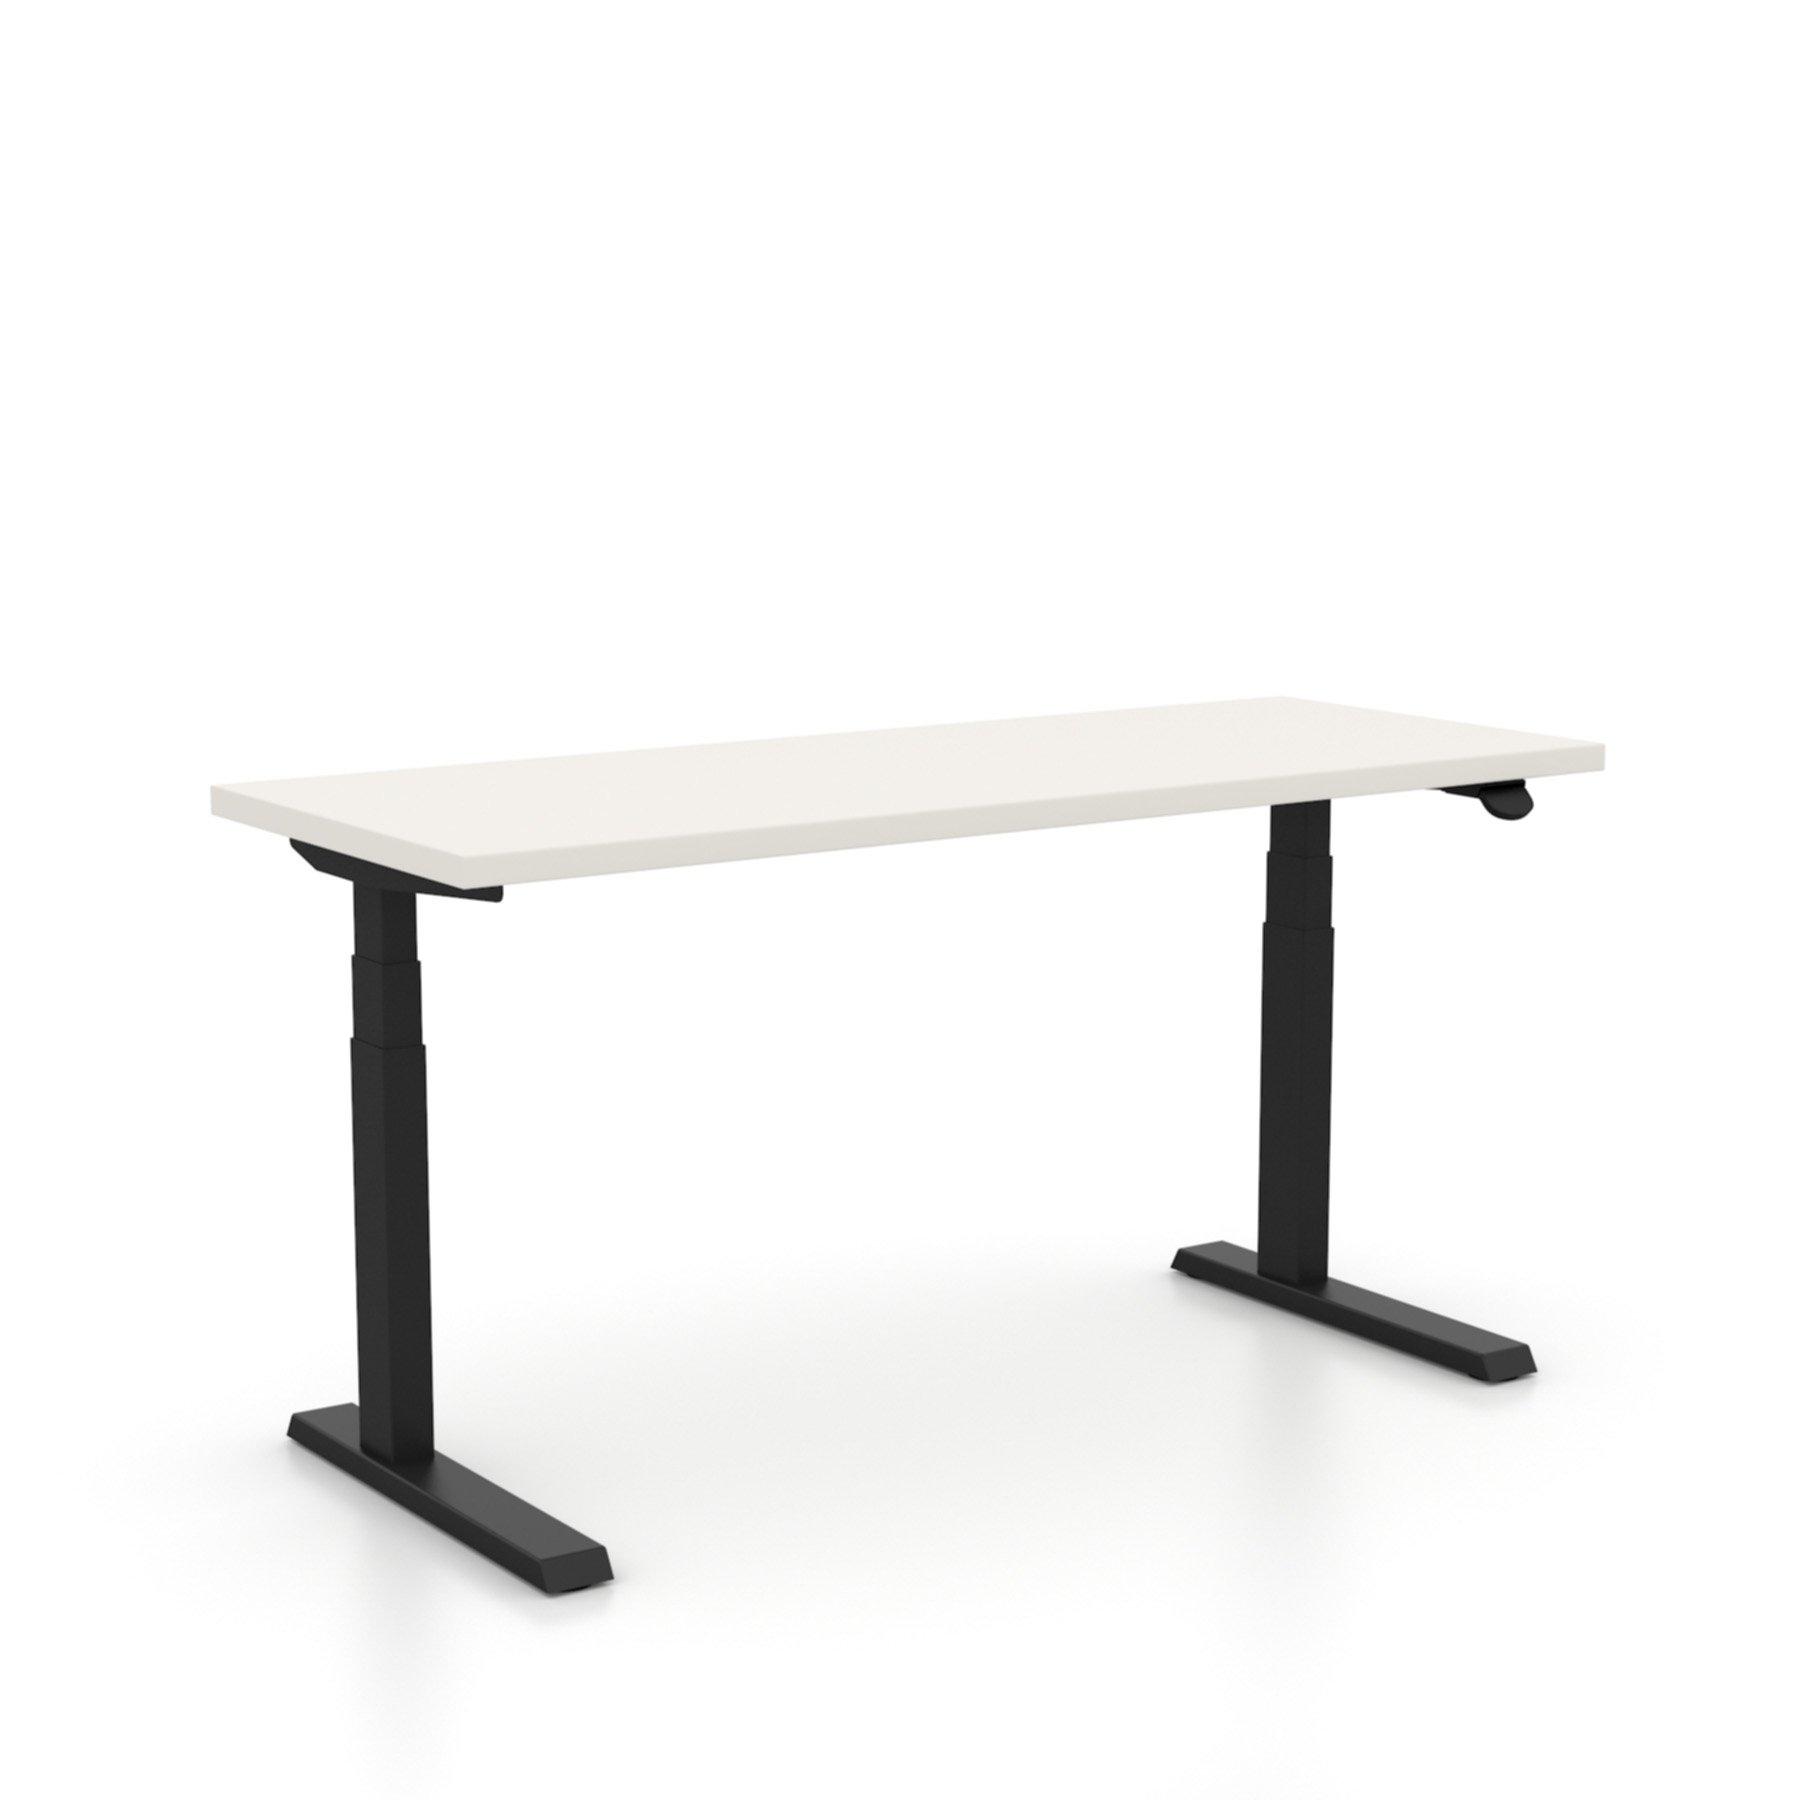 Haworth Upside Sit-to-Stand - 29